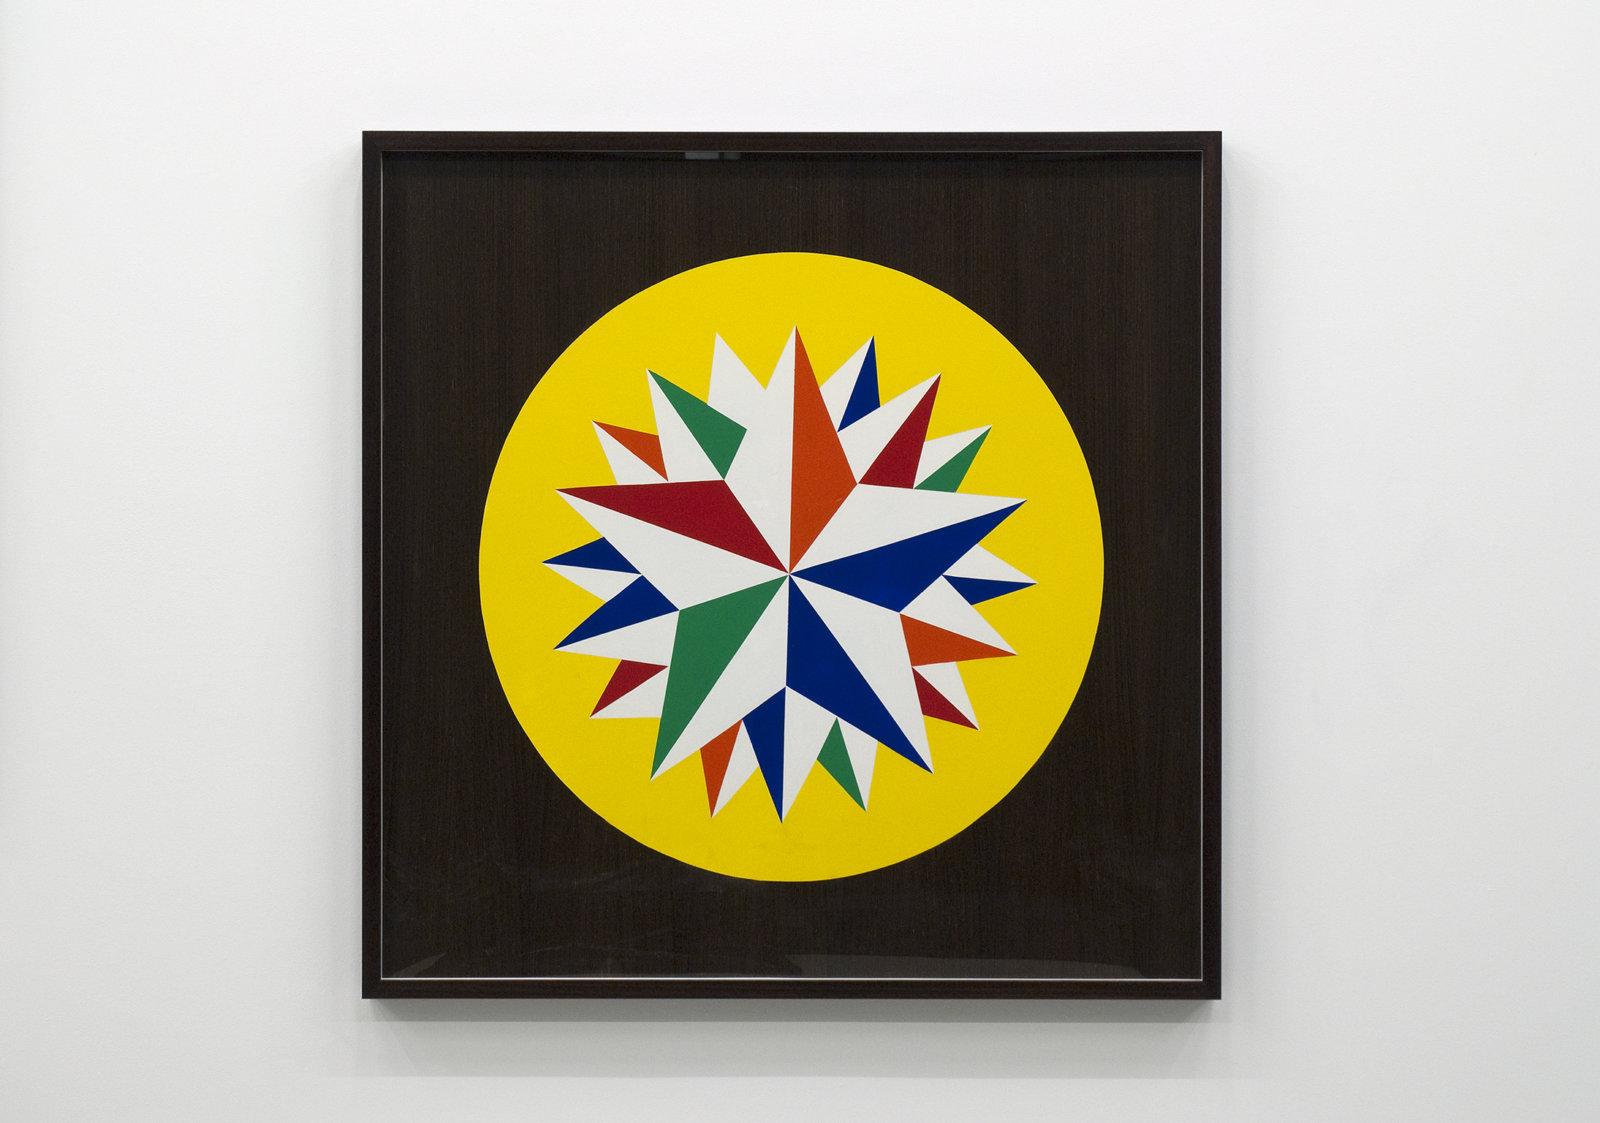 Myfanwy MacLeod, Hex VI, 2009, enamel on wood, 48 x 48 in. (122 x 122 cm) by Myfanwy MacLeod